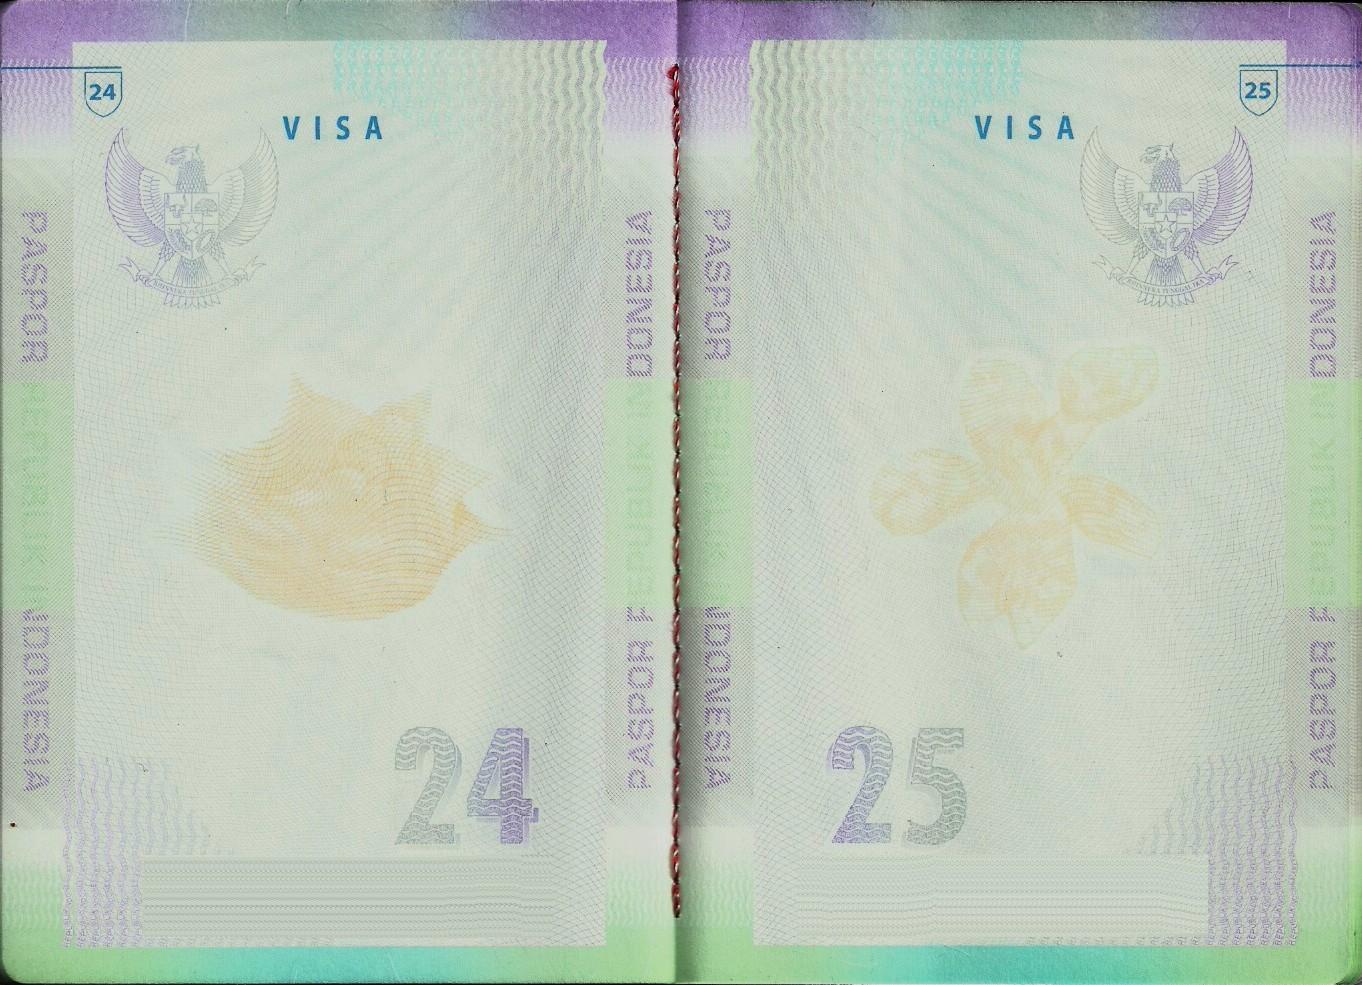 Passport photos visa pictures service by Passport Photo Indonesian passport photo size